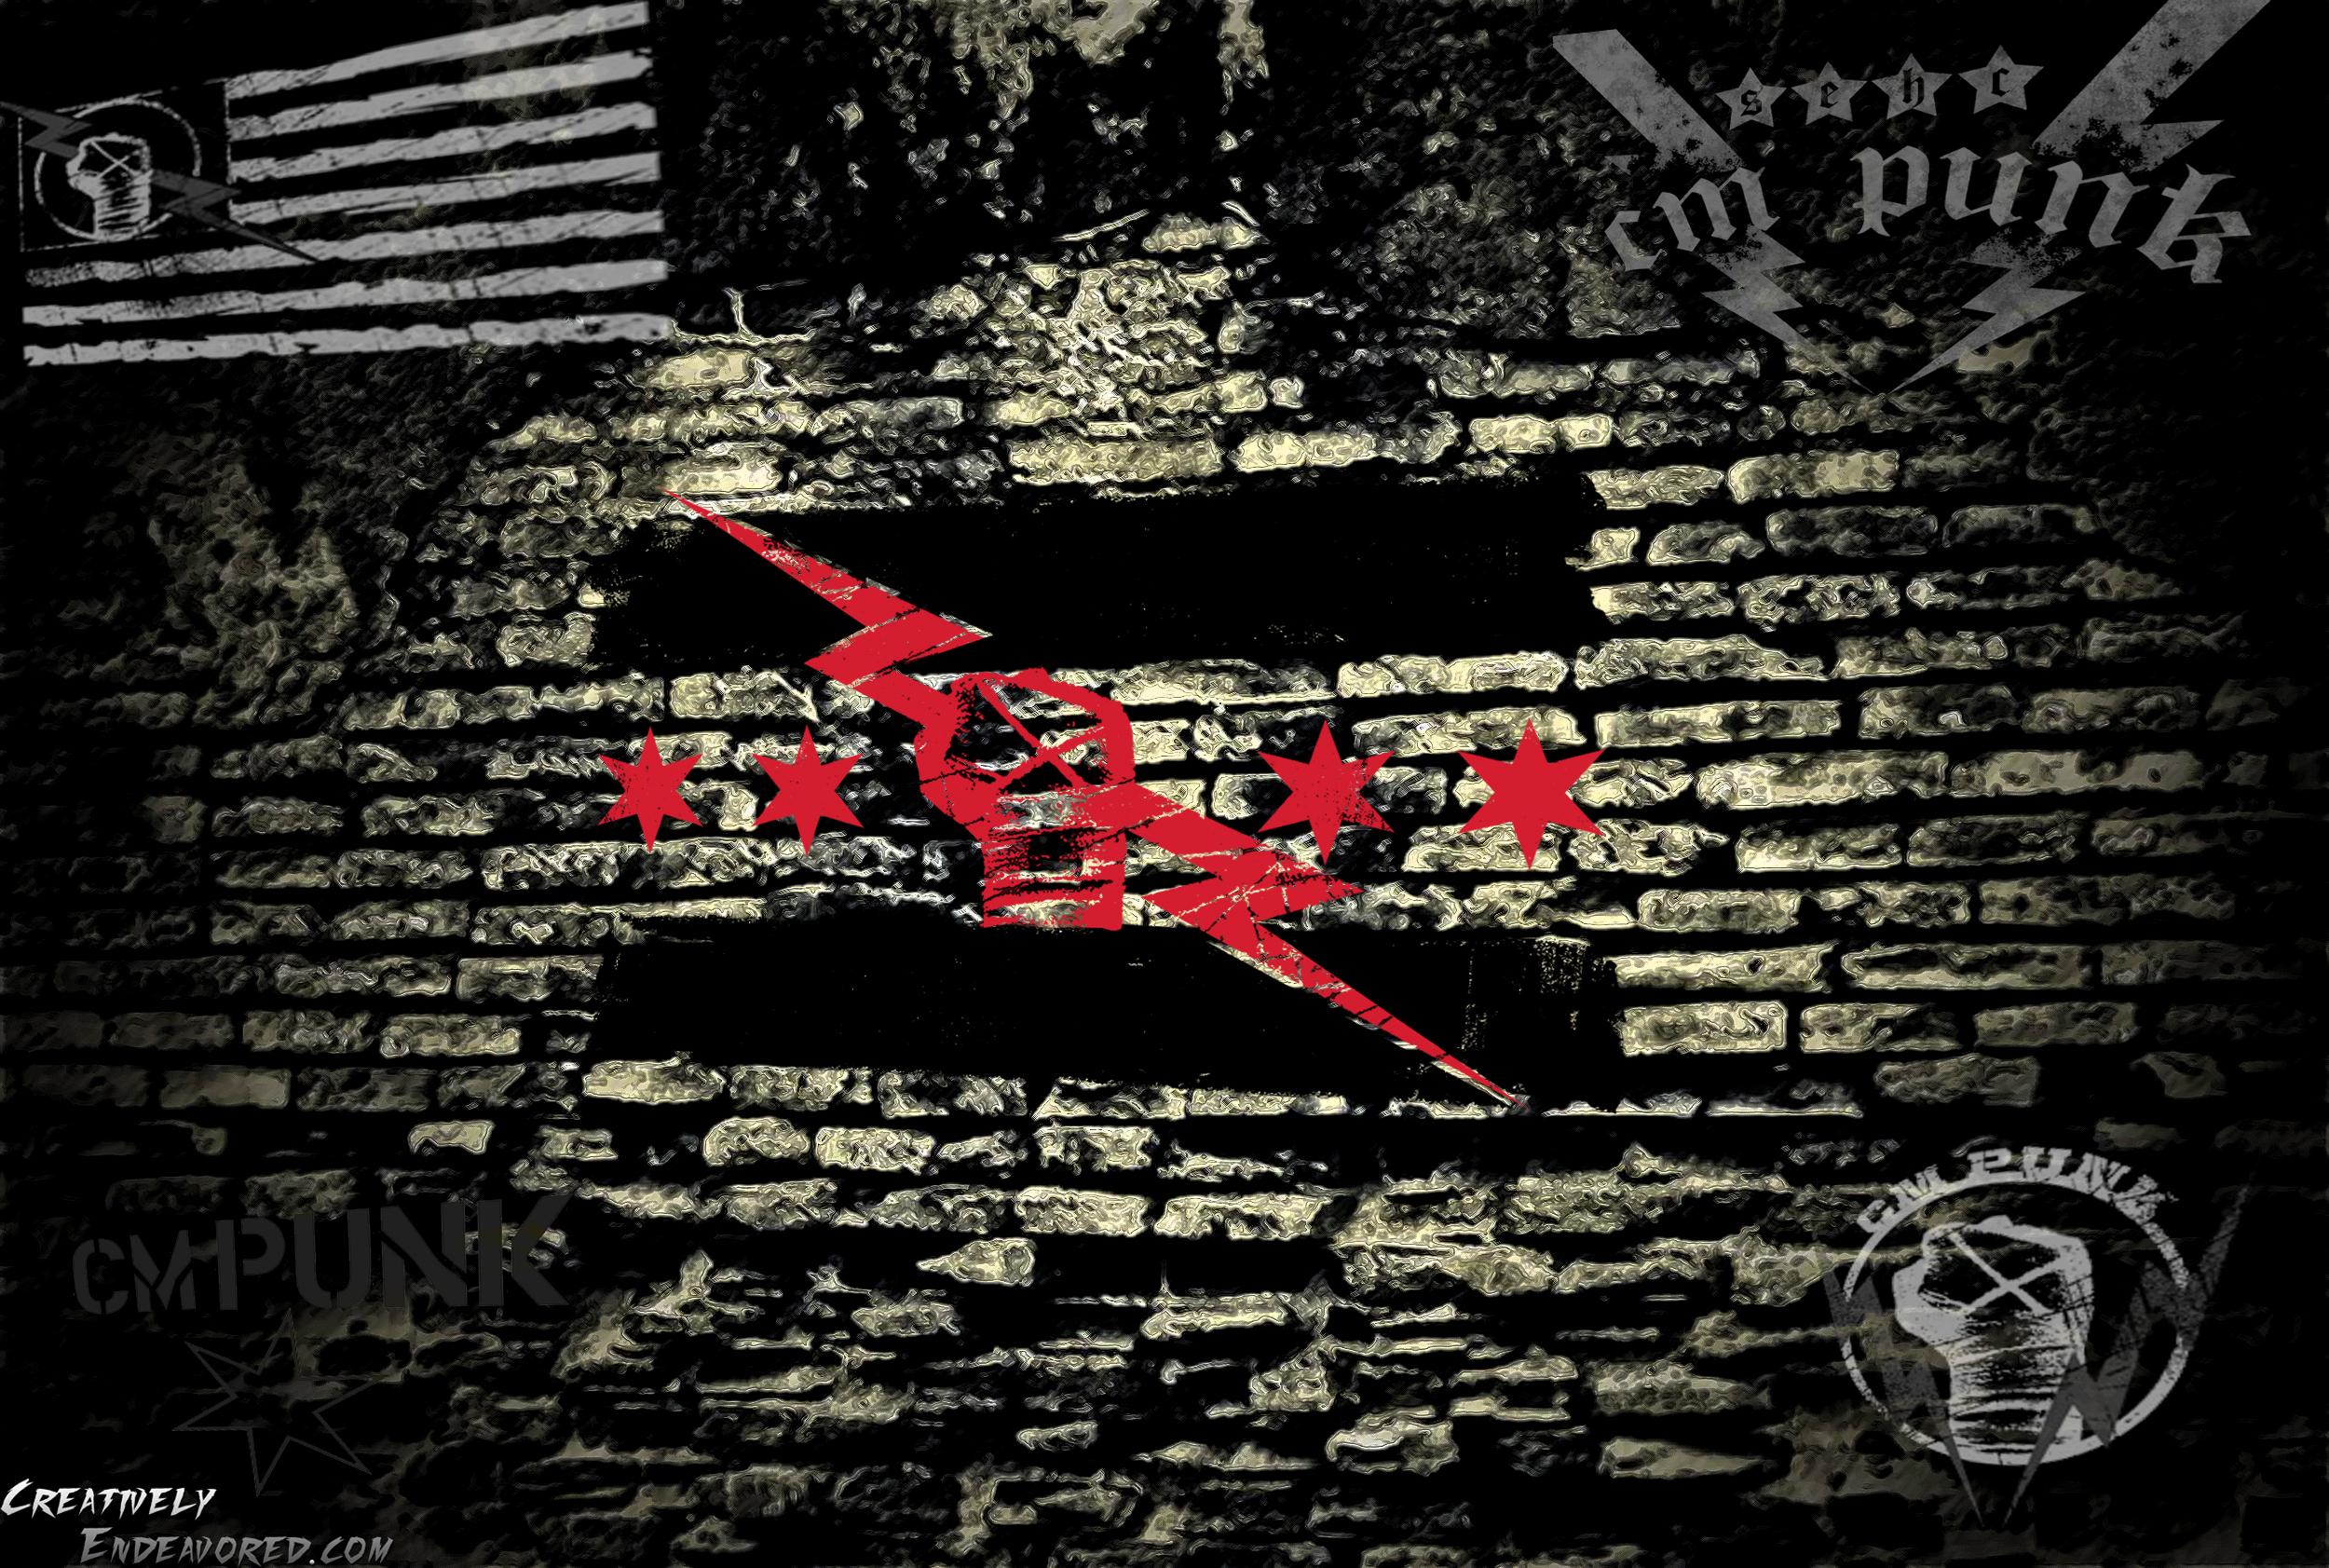 cm punk logo wallpaper cejpg 2500x1683